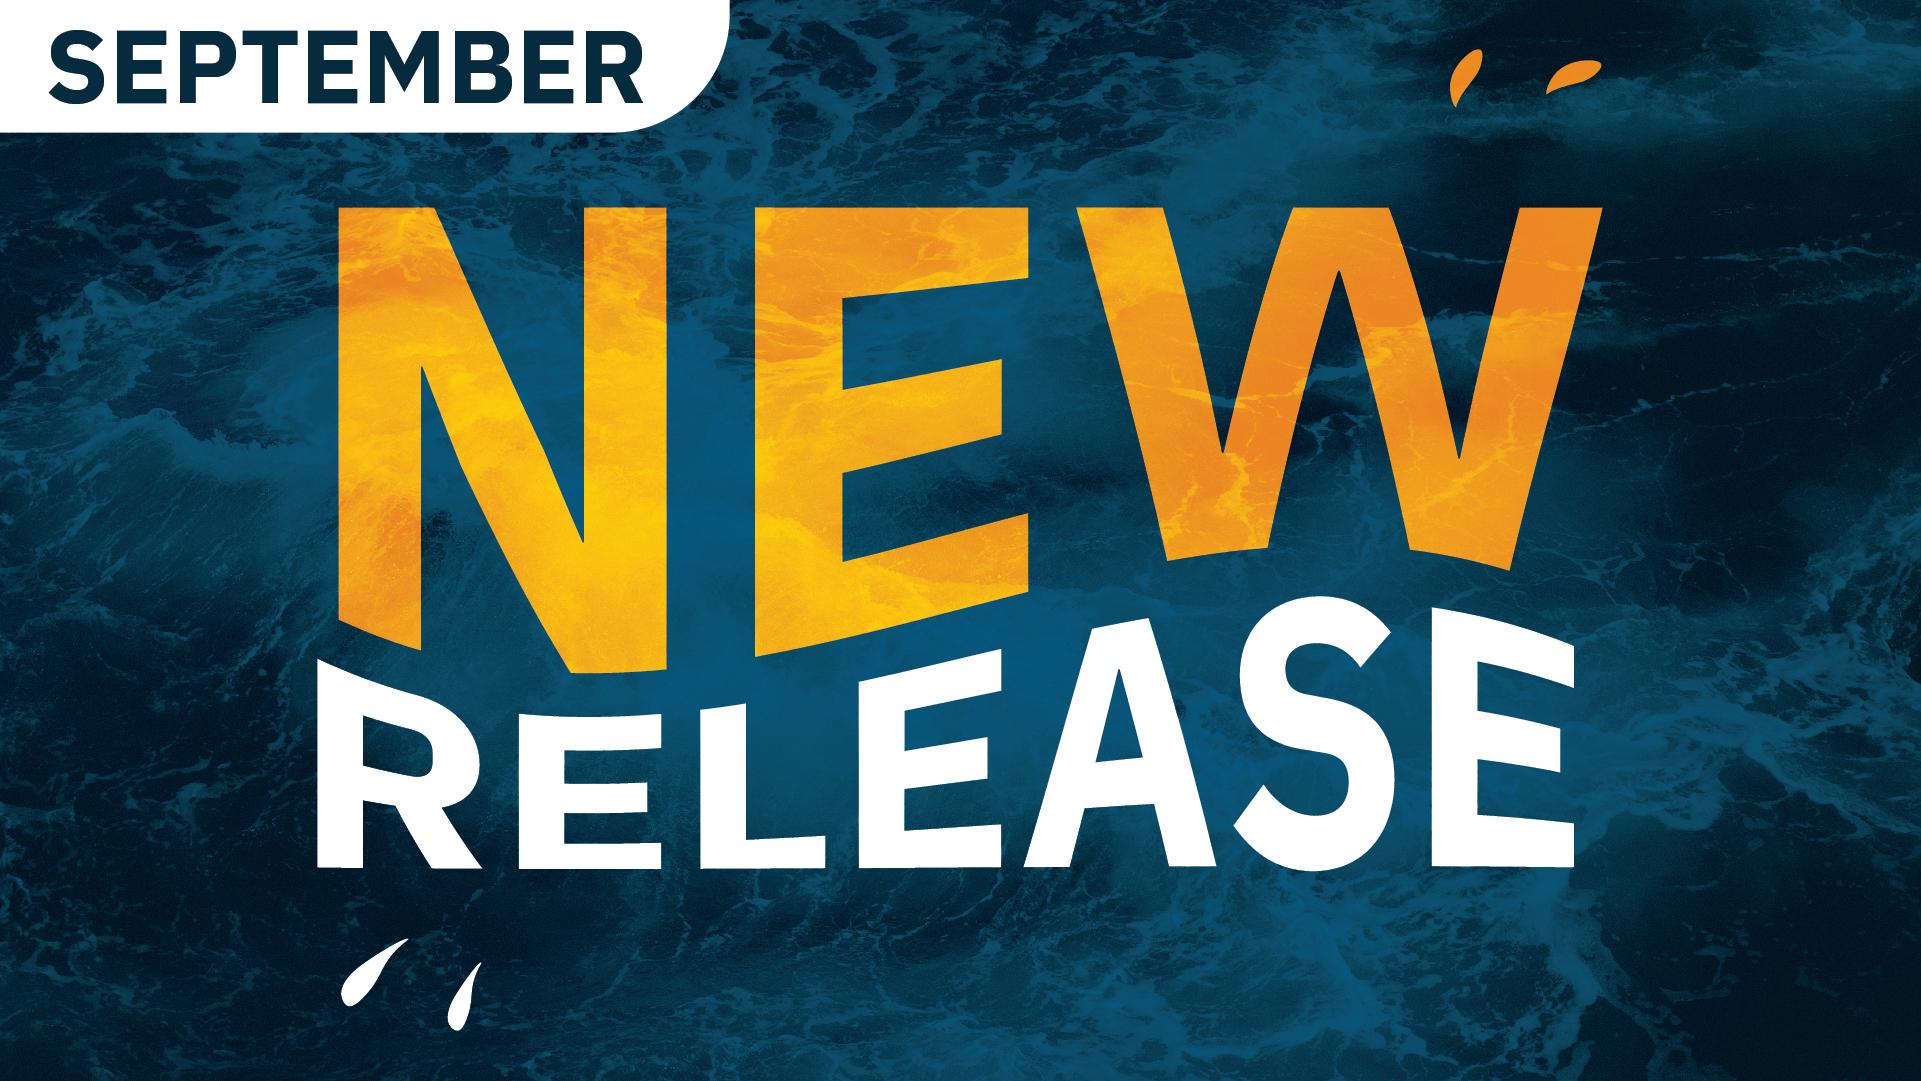 What's New in the Payara Enterprise Platform September Release?